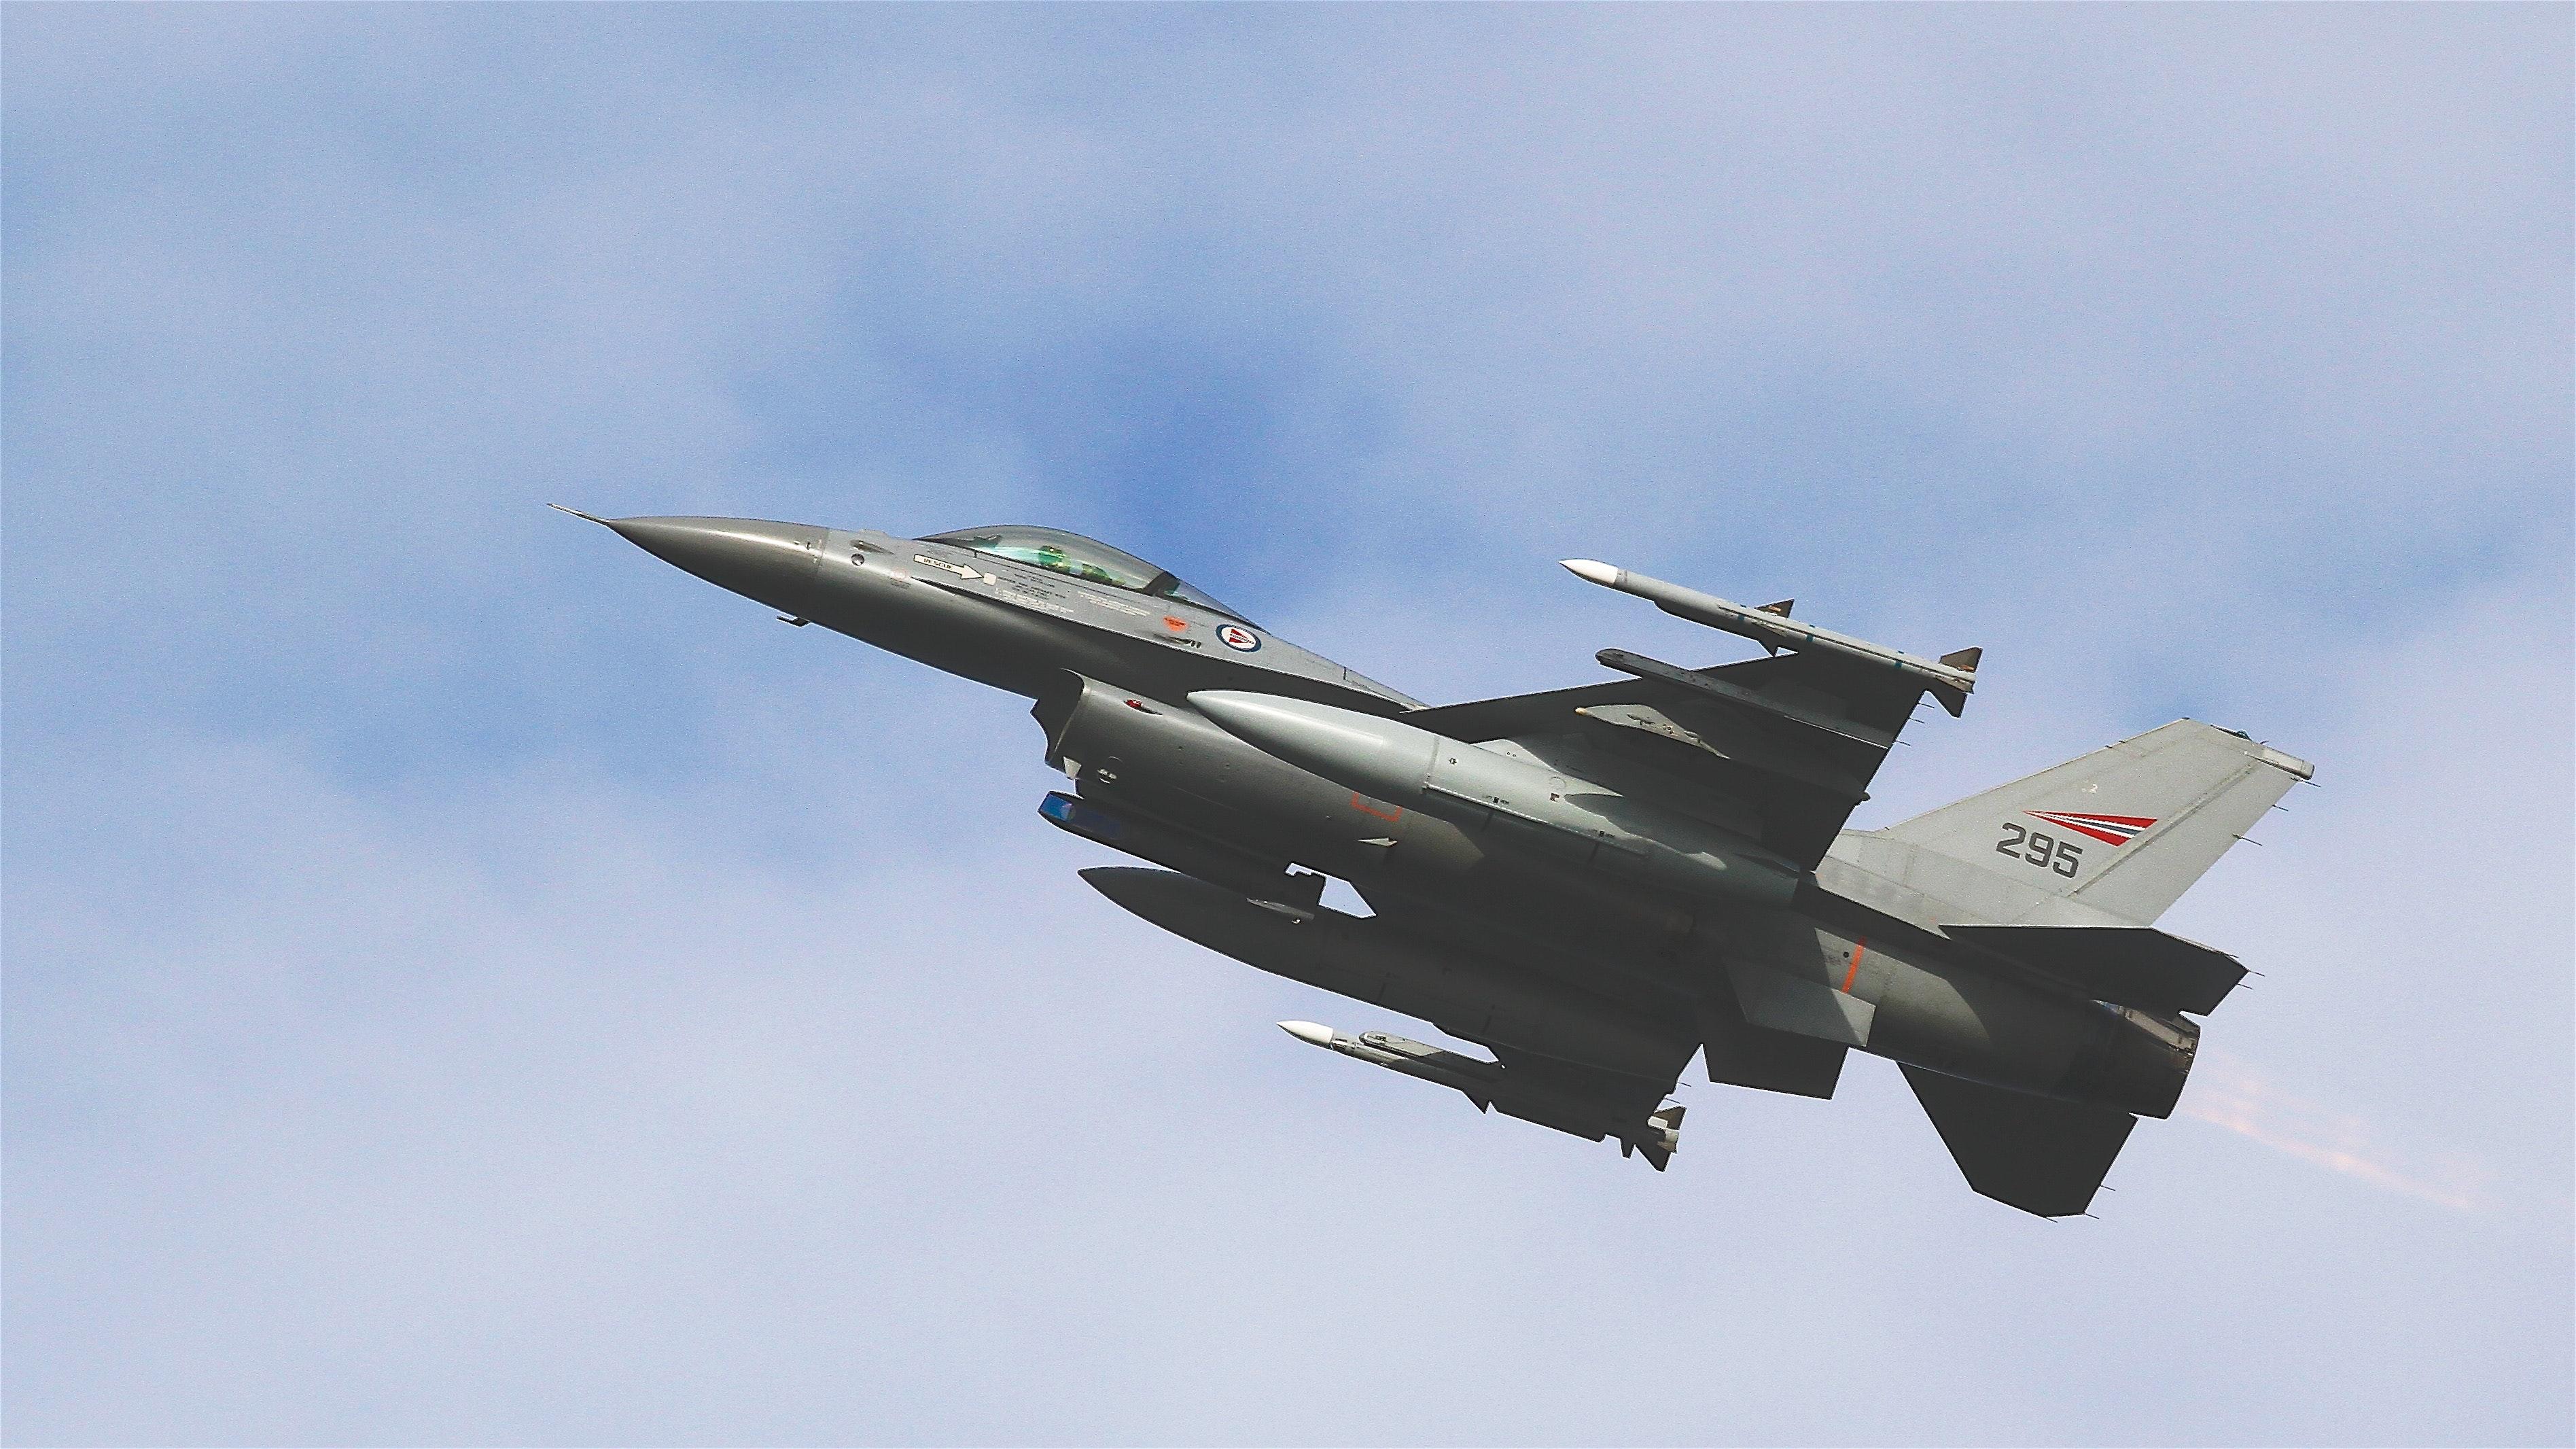 General-Dynamics-F-16-Fighting-Falcon